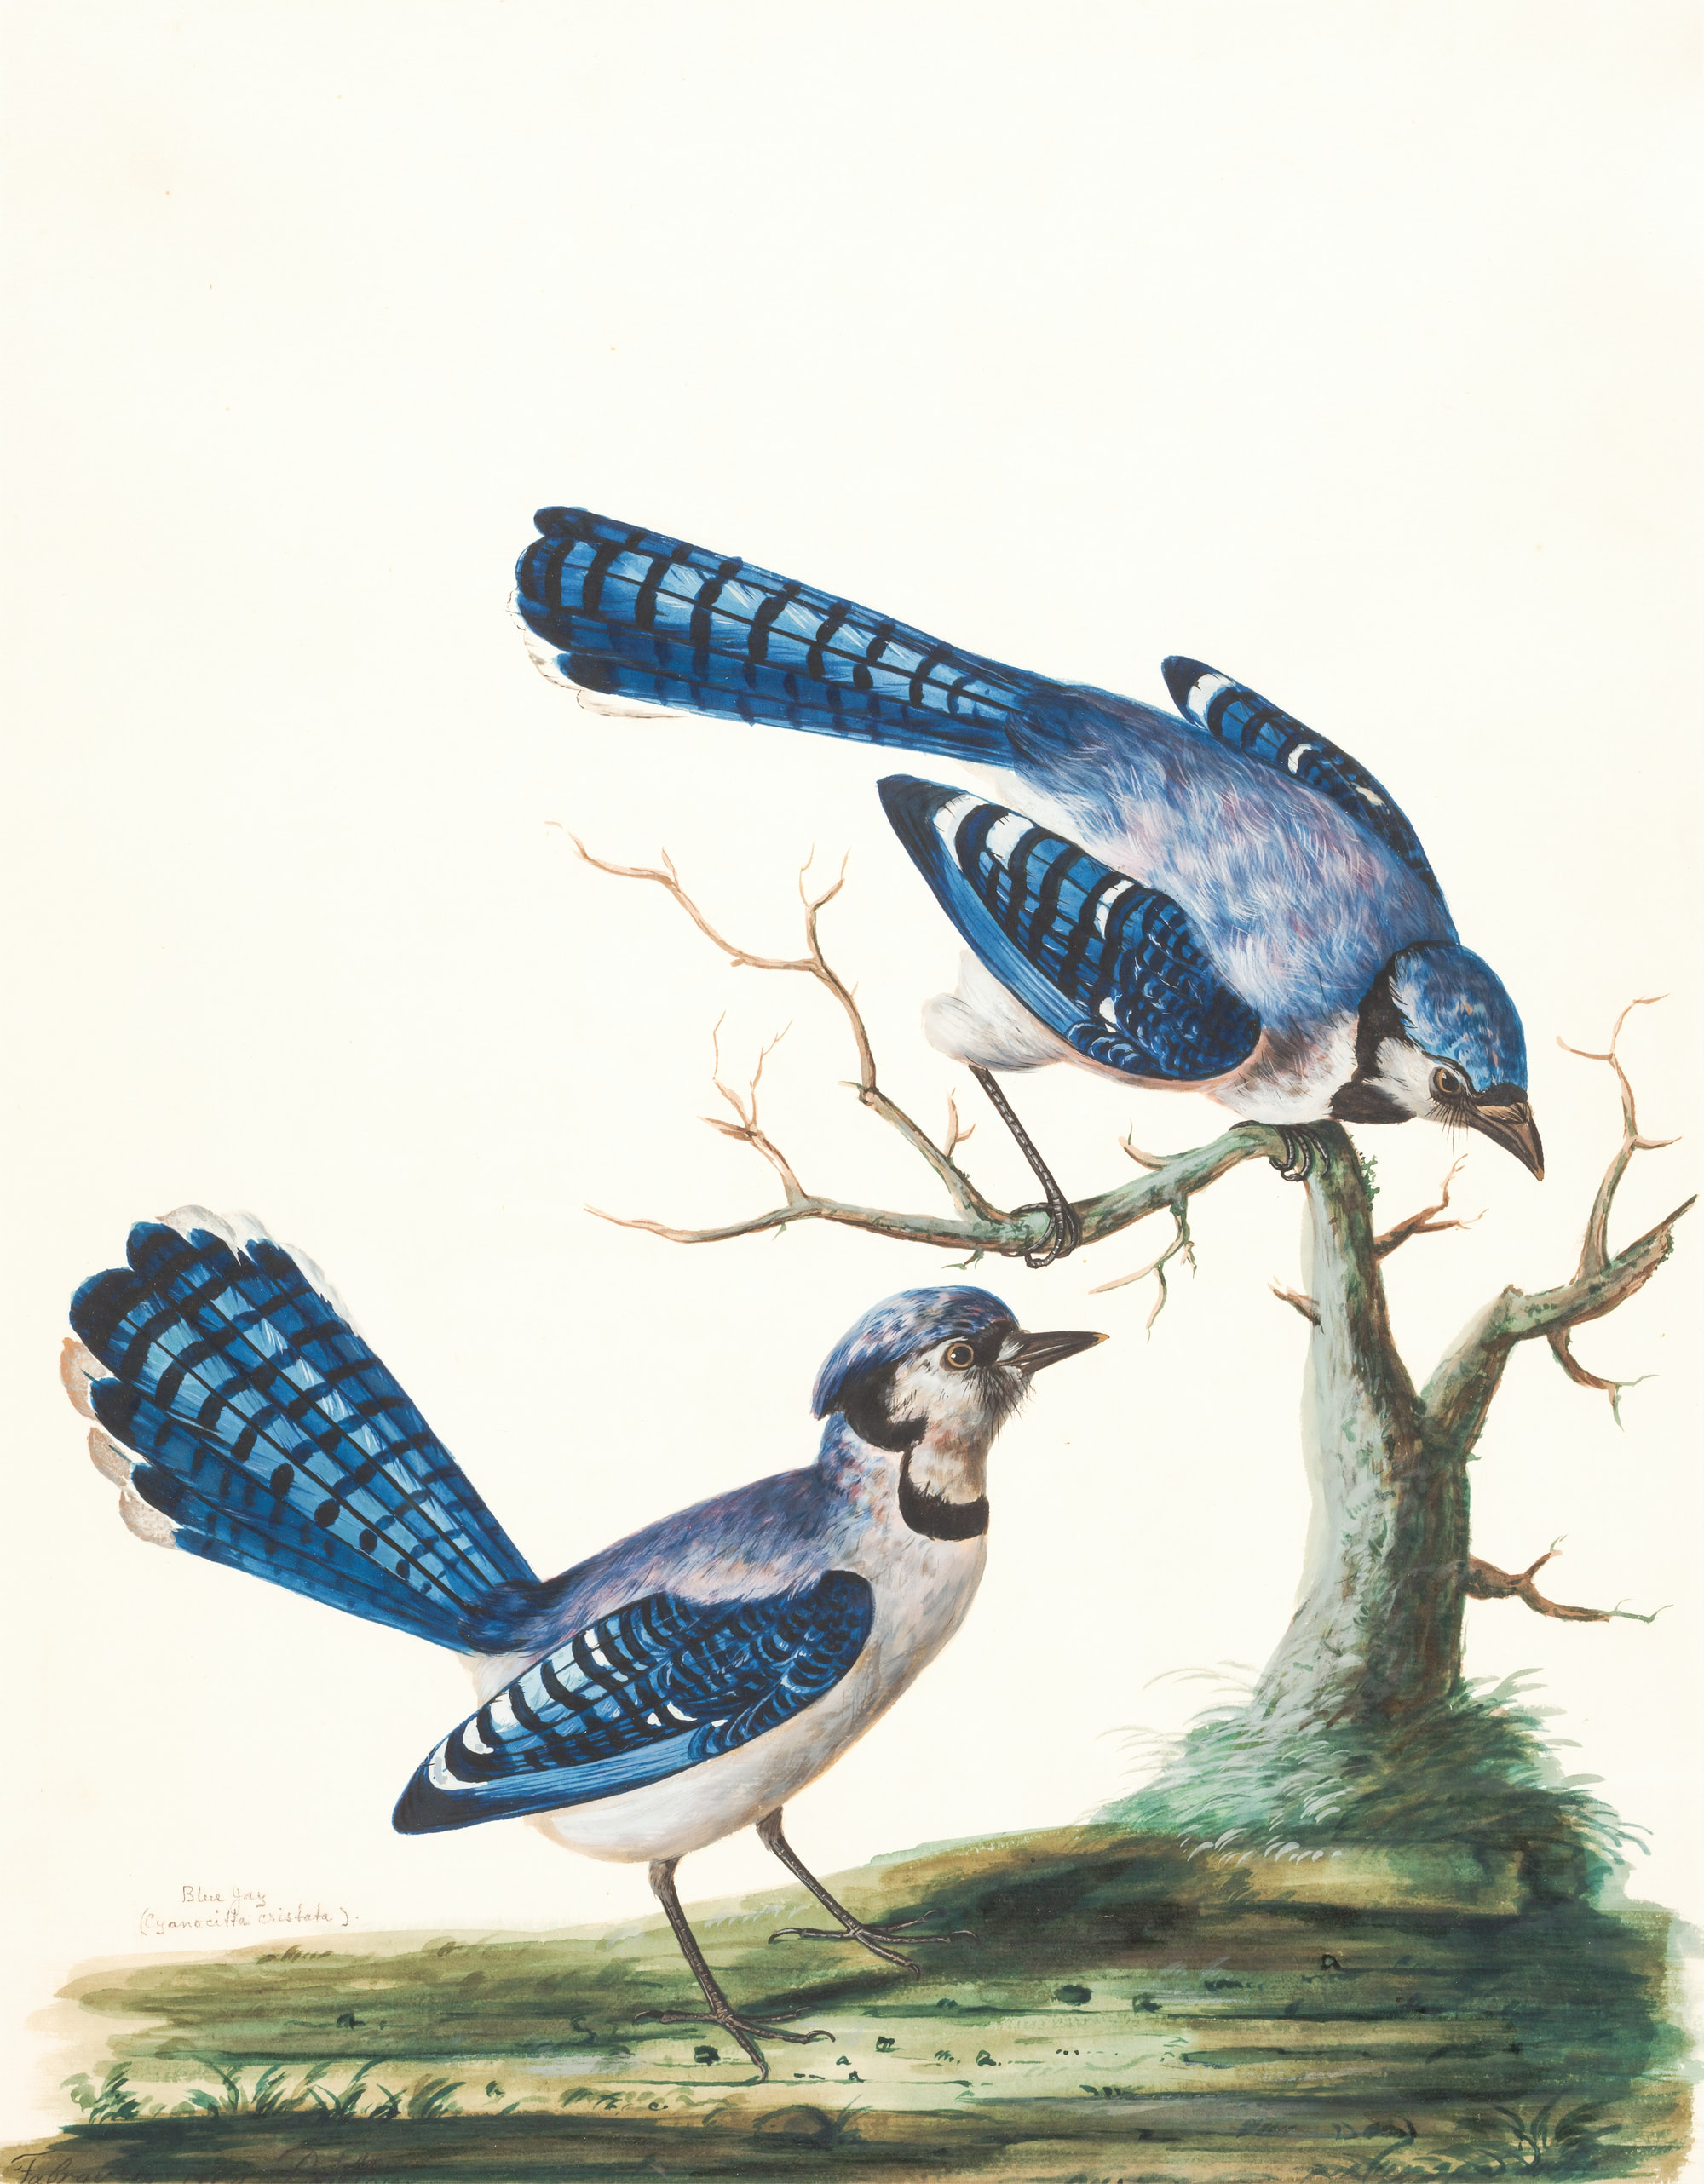 Blue Jays.